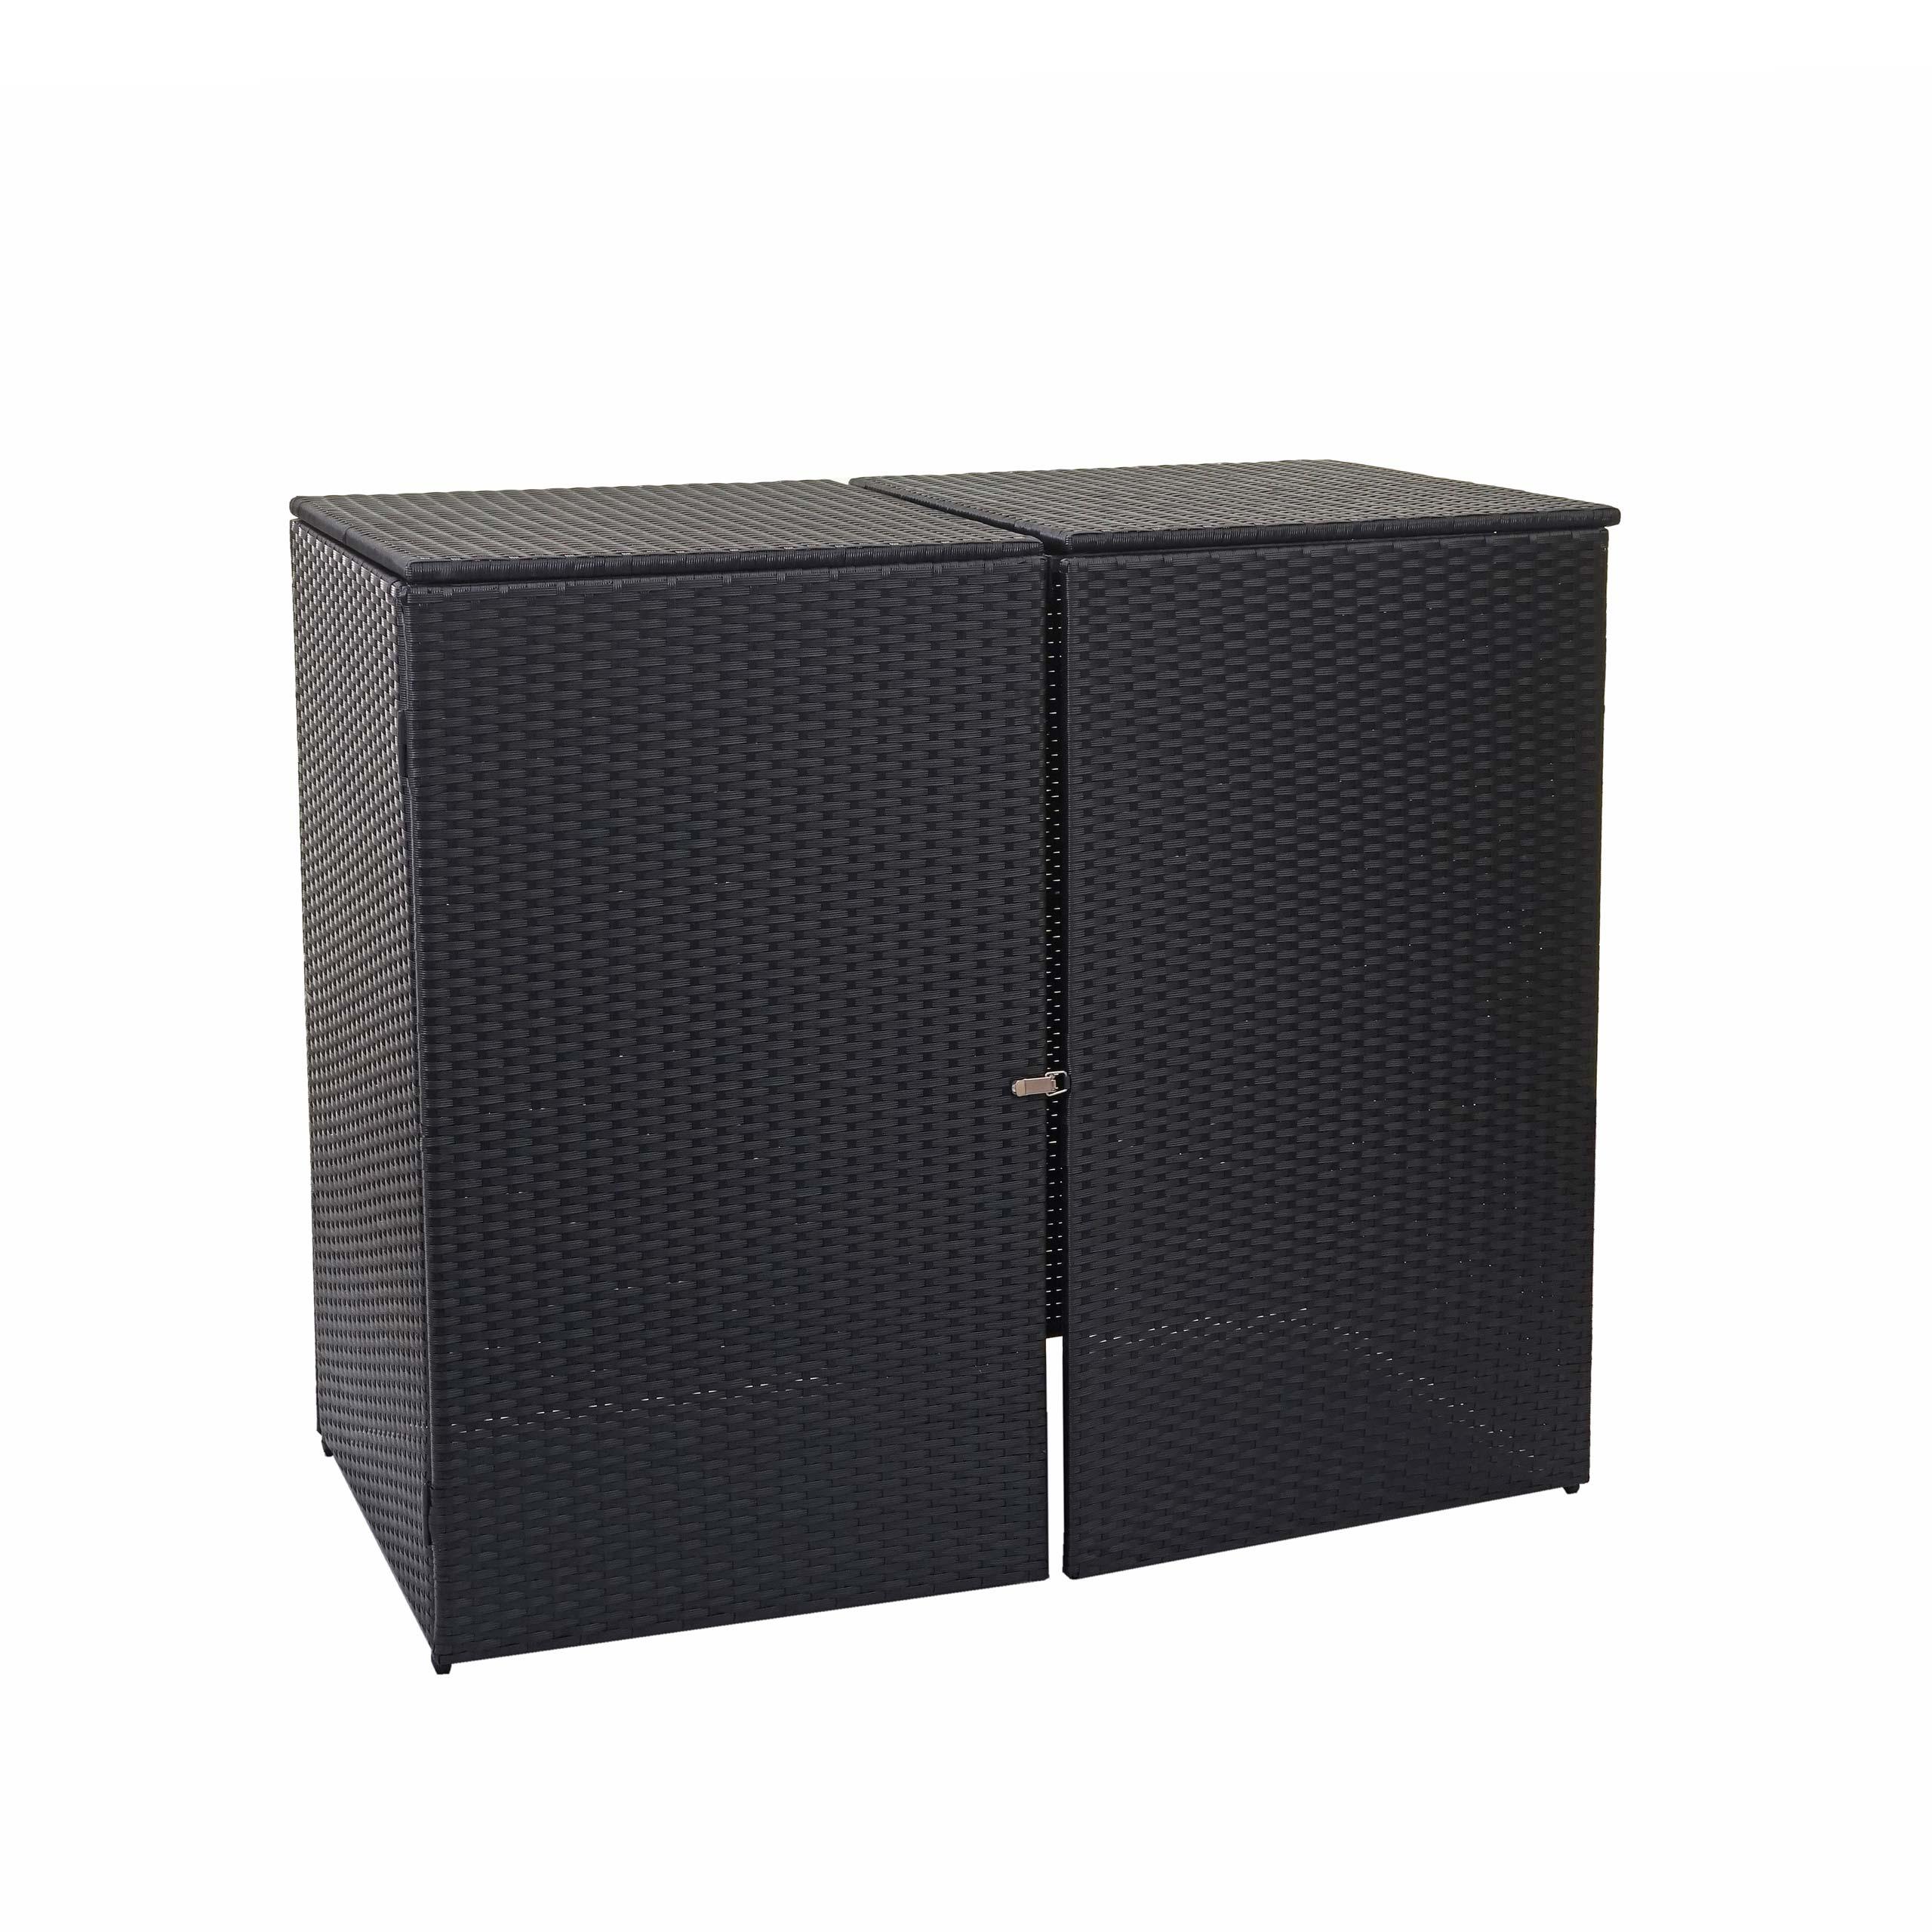 2er-Mülltonnenverkleidung MCW-E25 Mülltonnenbox Poly-Rattan 2x120l schwarz